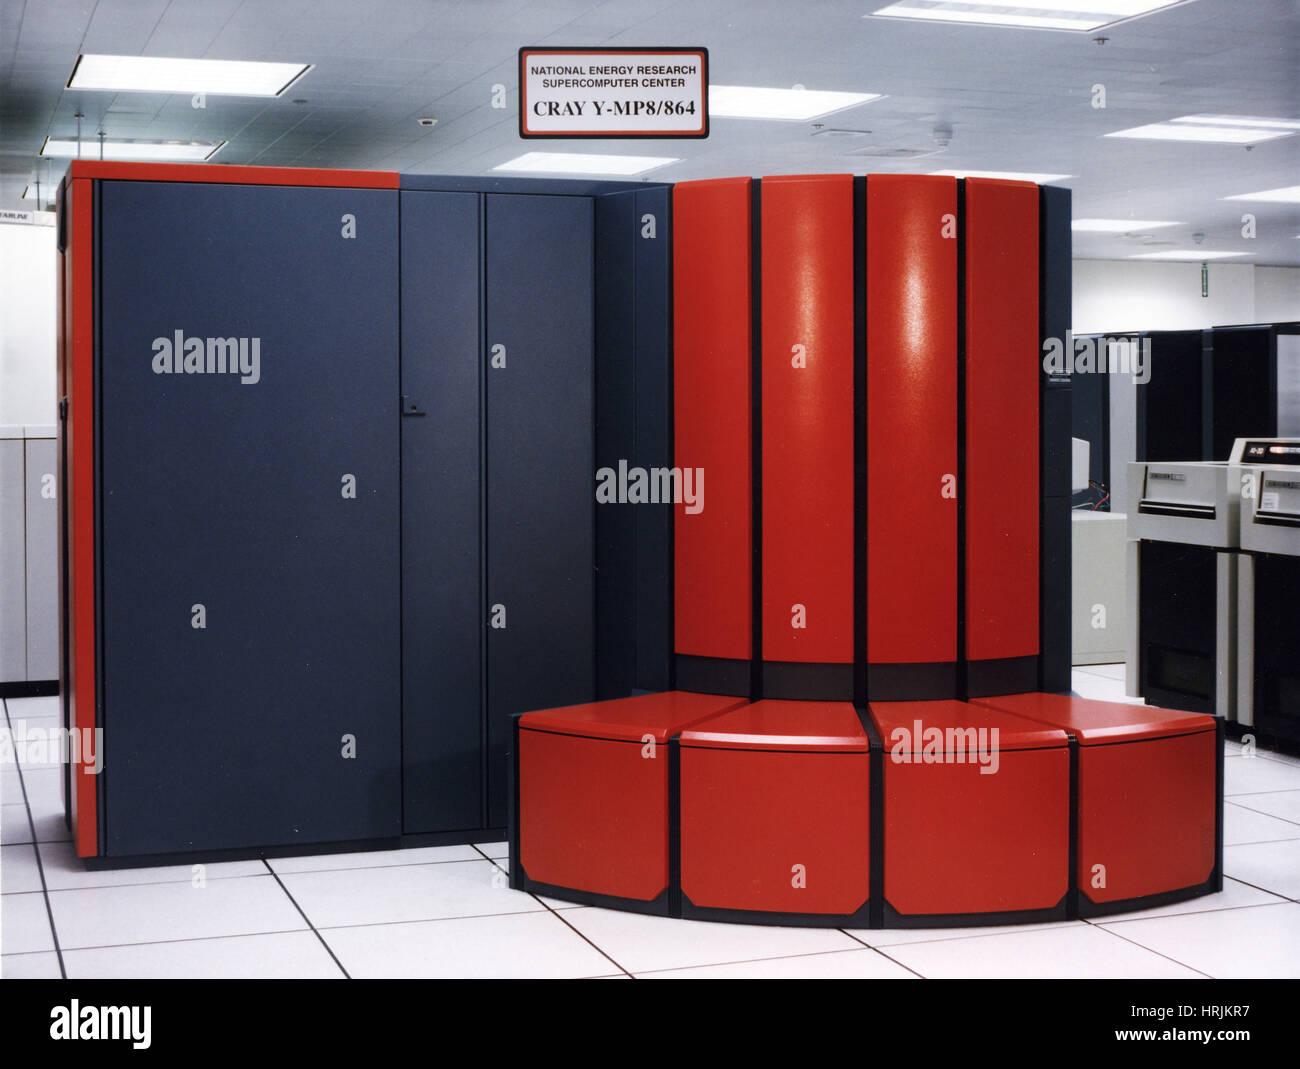 Cray Y-MP8/864 Supercomputer, LLNL, 1990er Jahre Stockbild